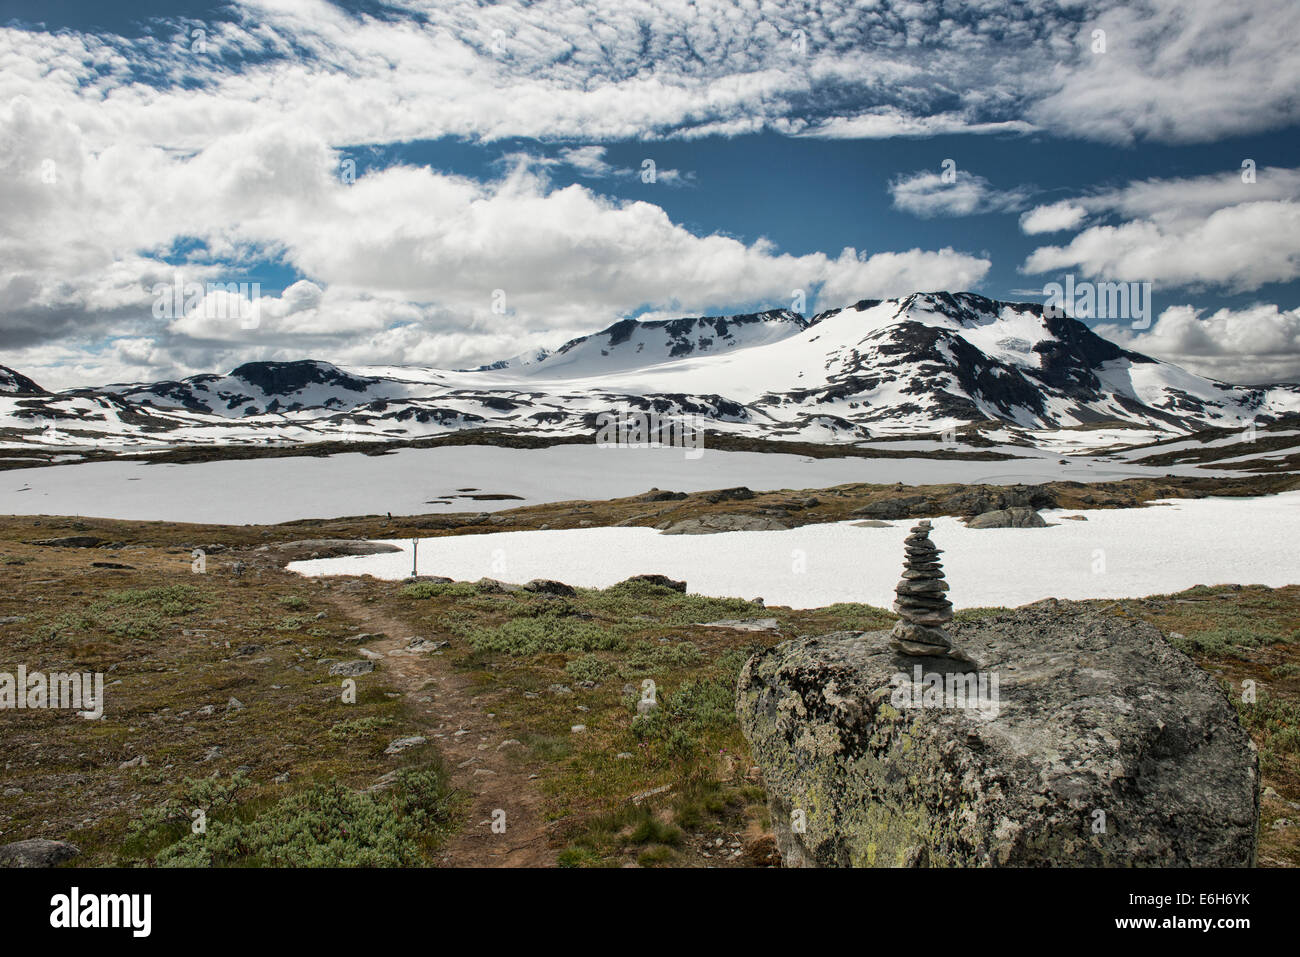 alpine scenery in Jotunheimen National Park, Norway - Stock Image